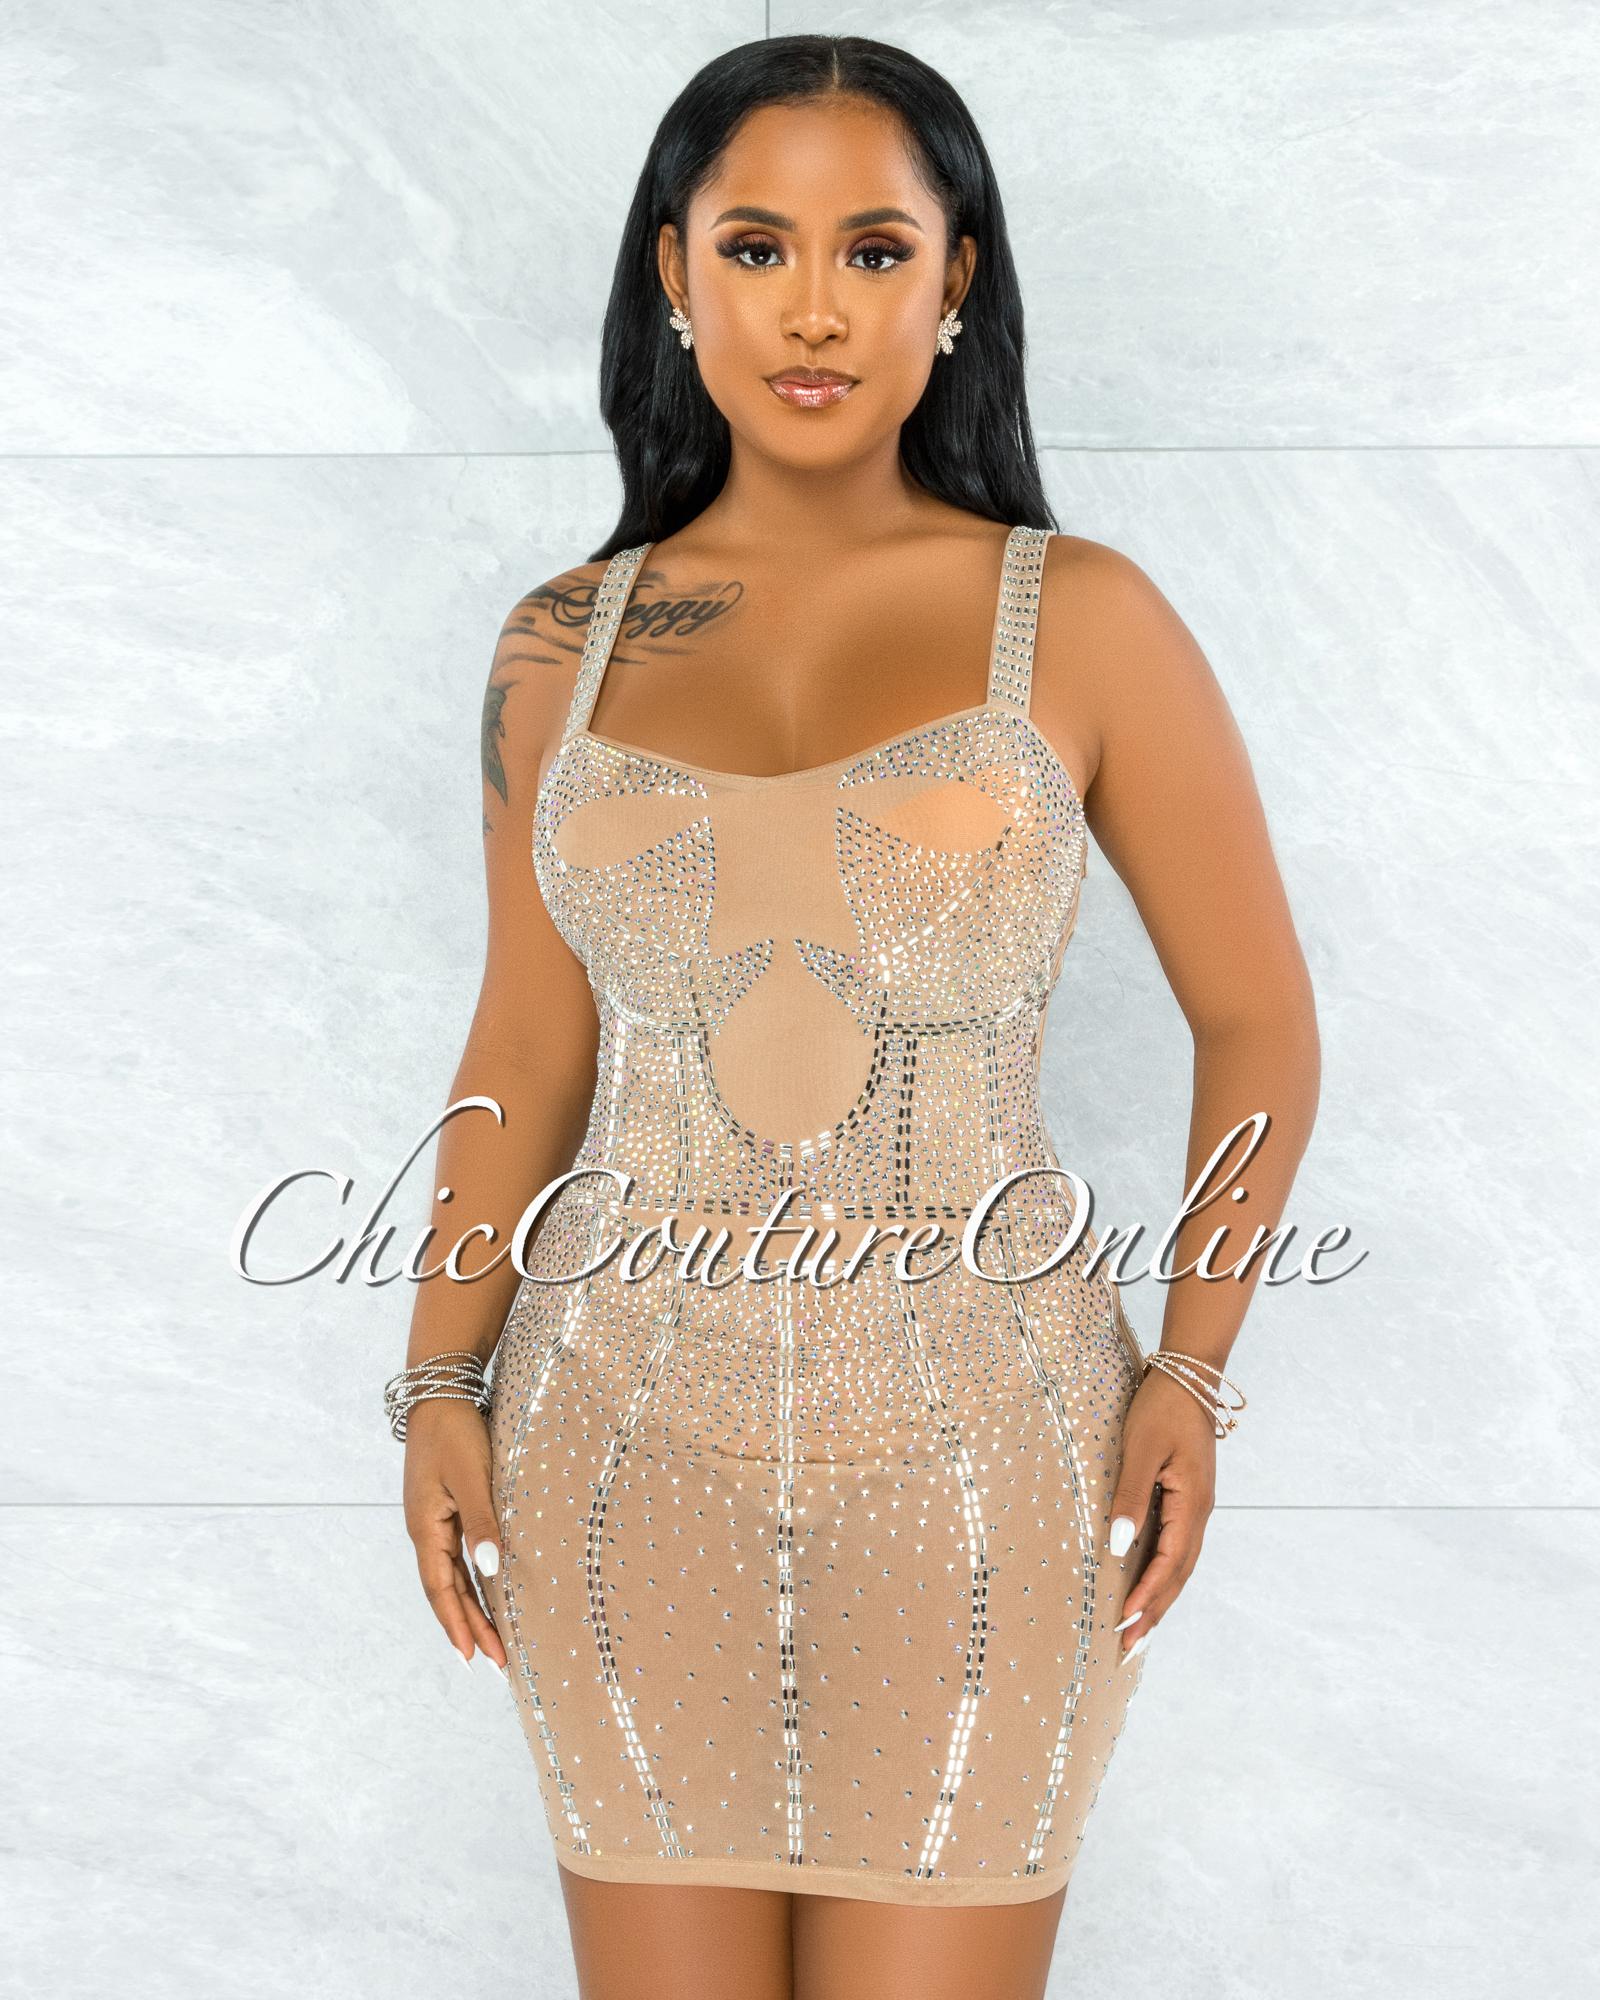 Pelicia Nude Silver Rhinestones Mesh Bodysuit Dress